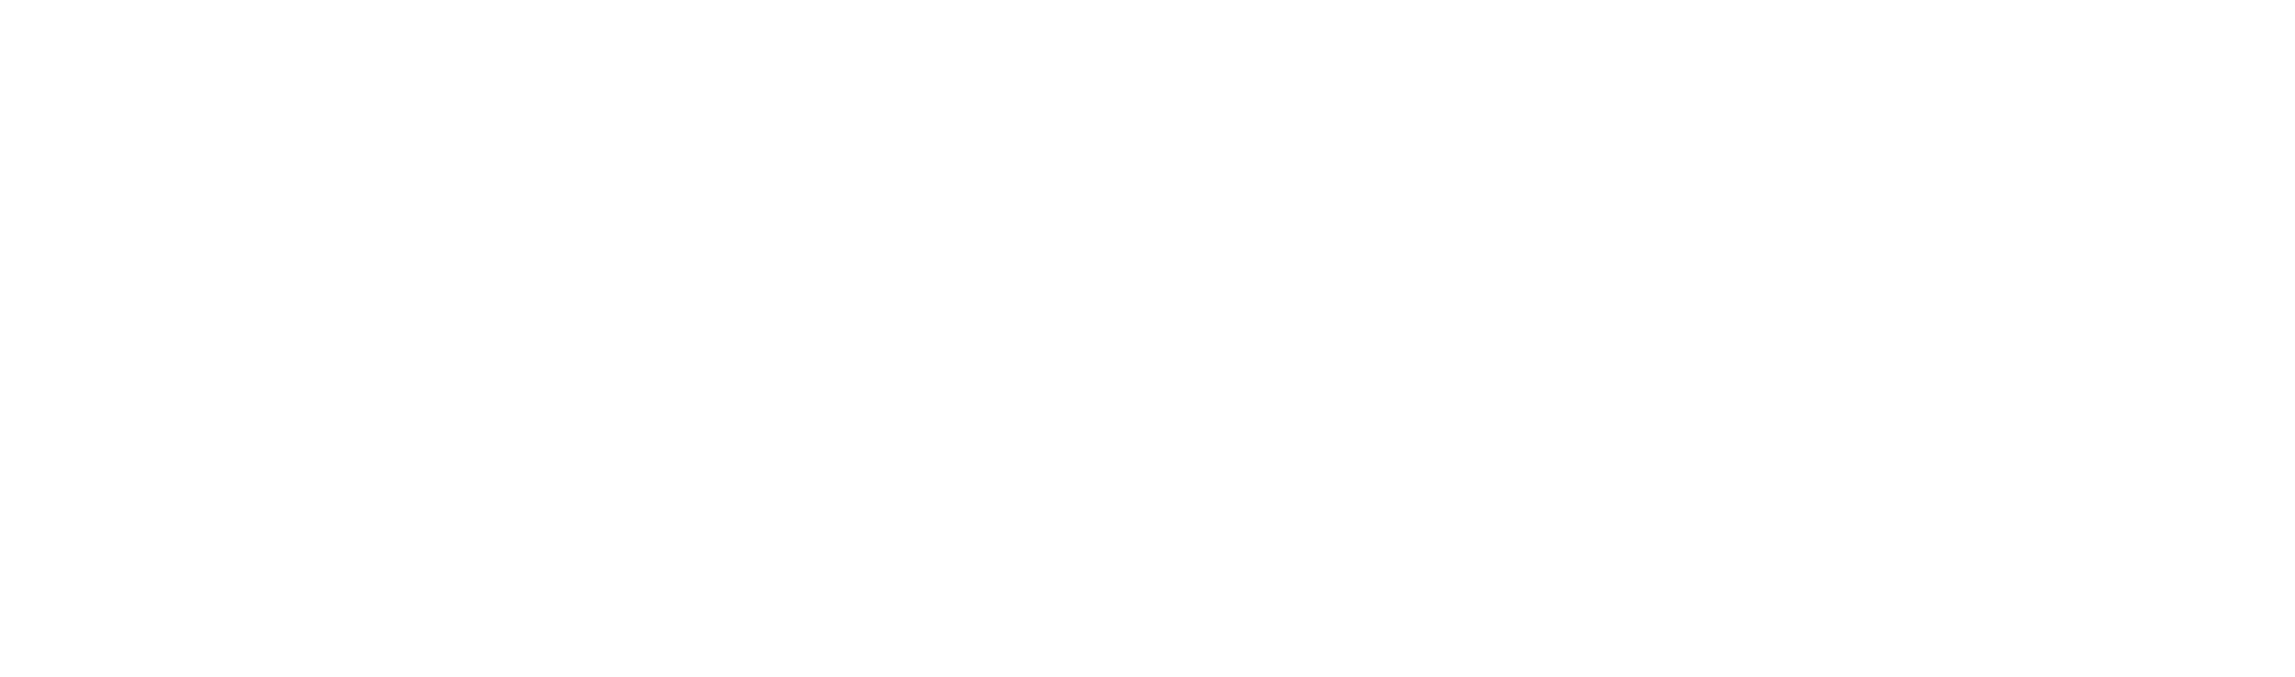 Pringle Farm